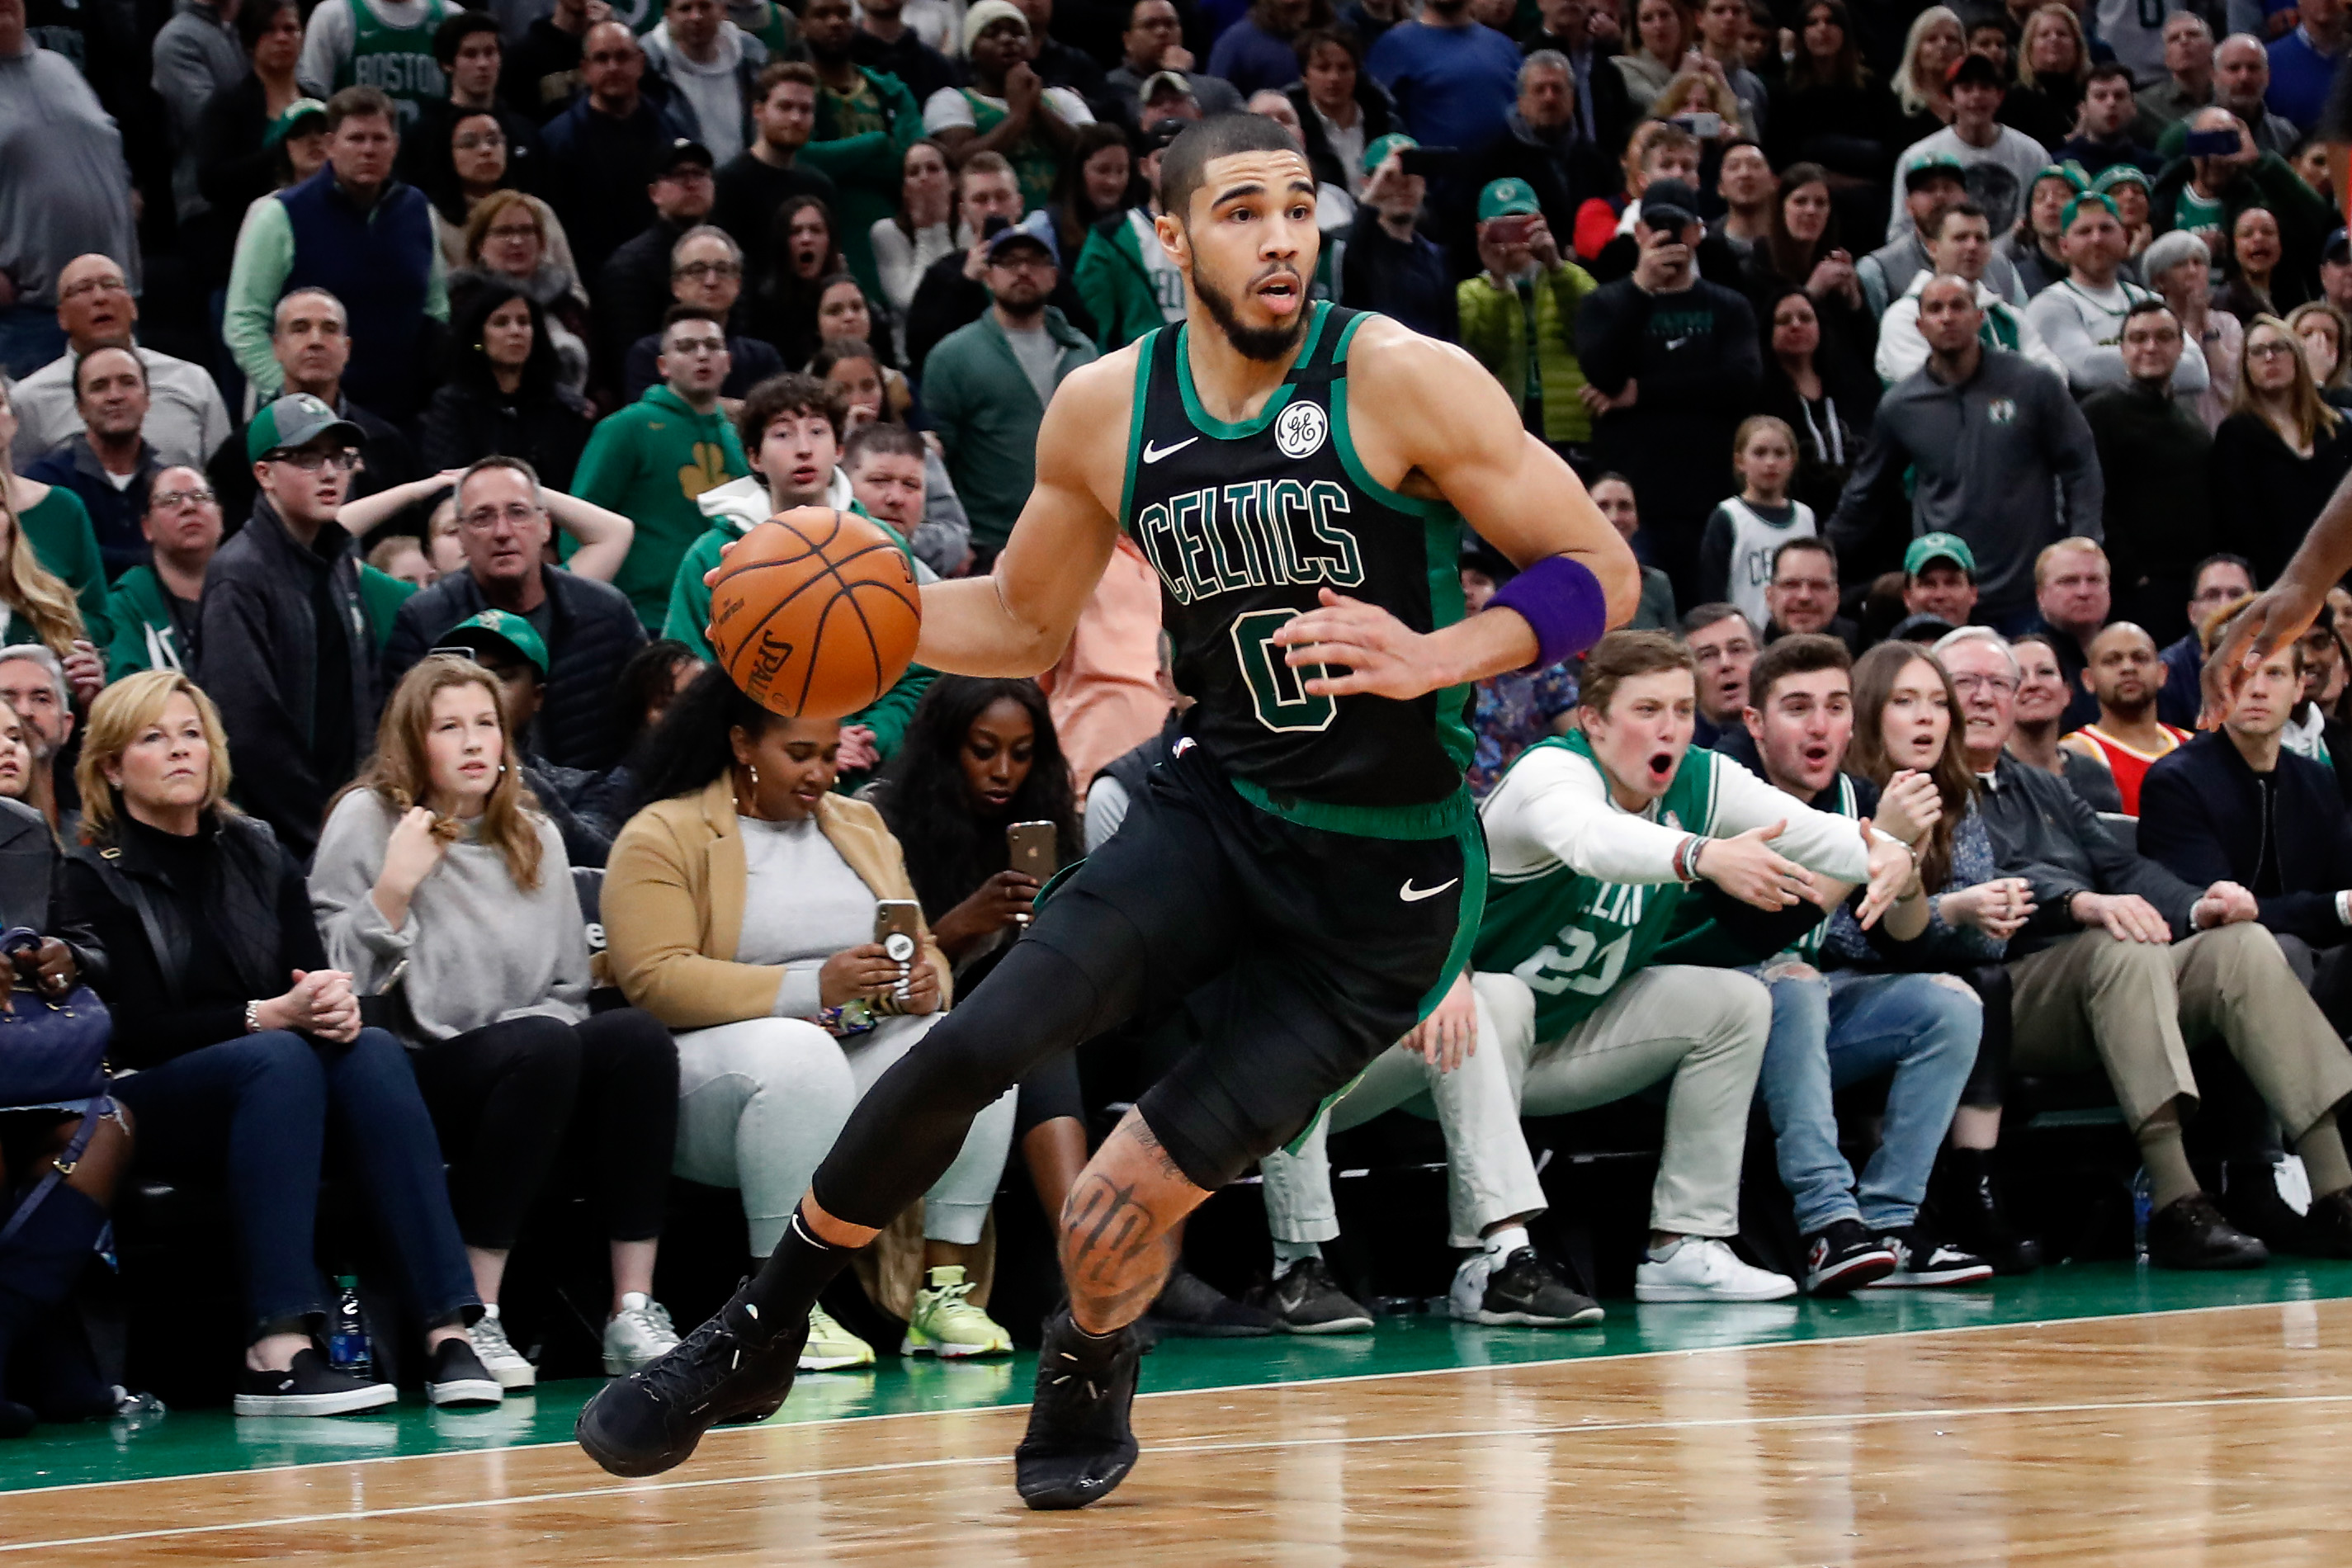 Boston Celtics forward Jayson Tatum drives during the second half against the Houston Rockets at TD Garden.